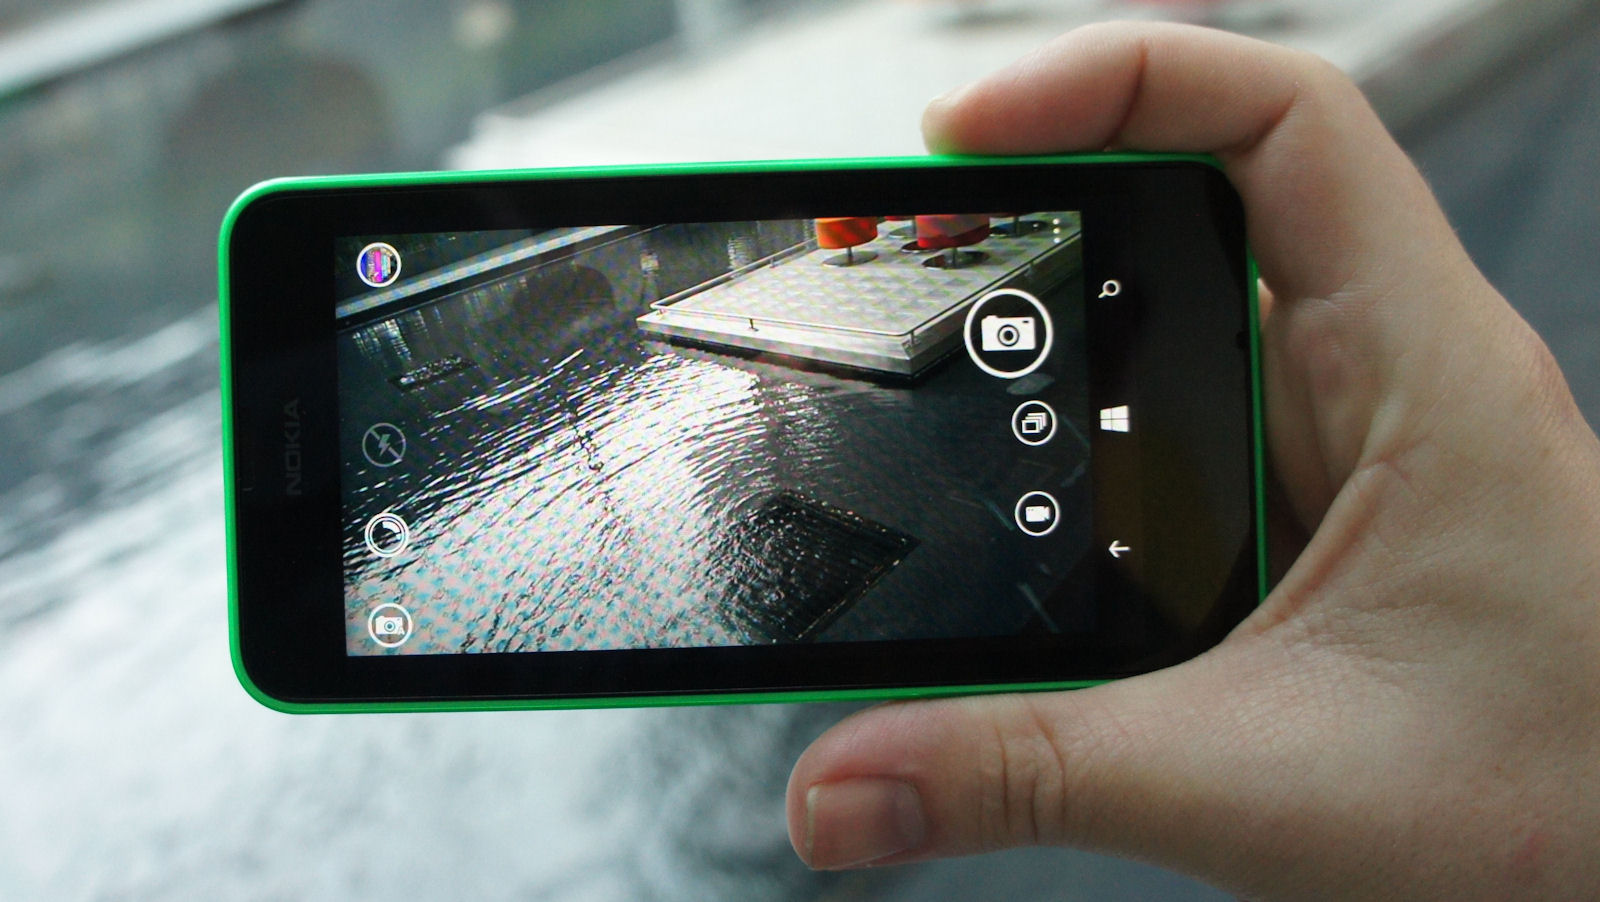 camera app for windows phone 8.1